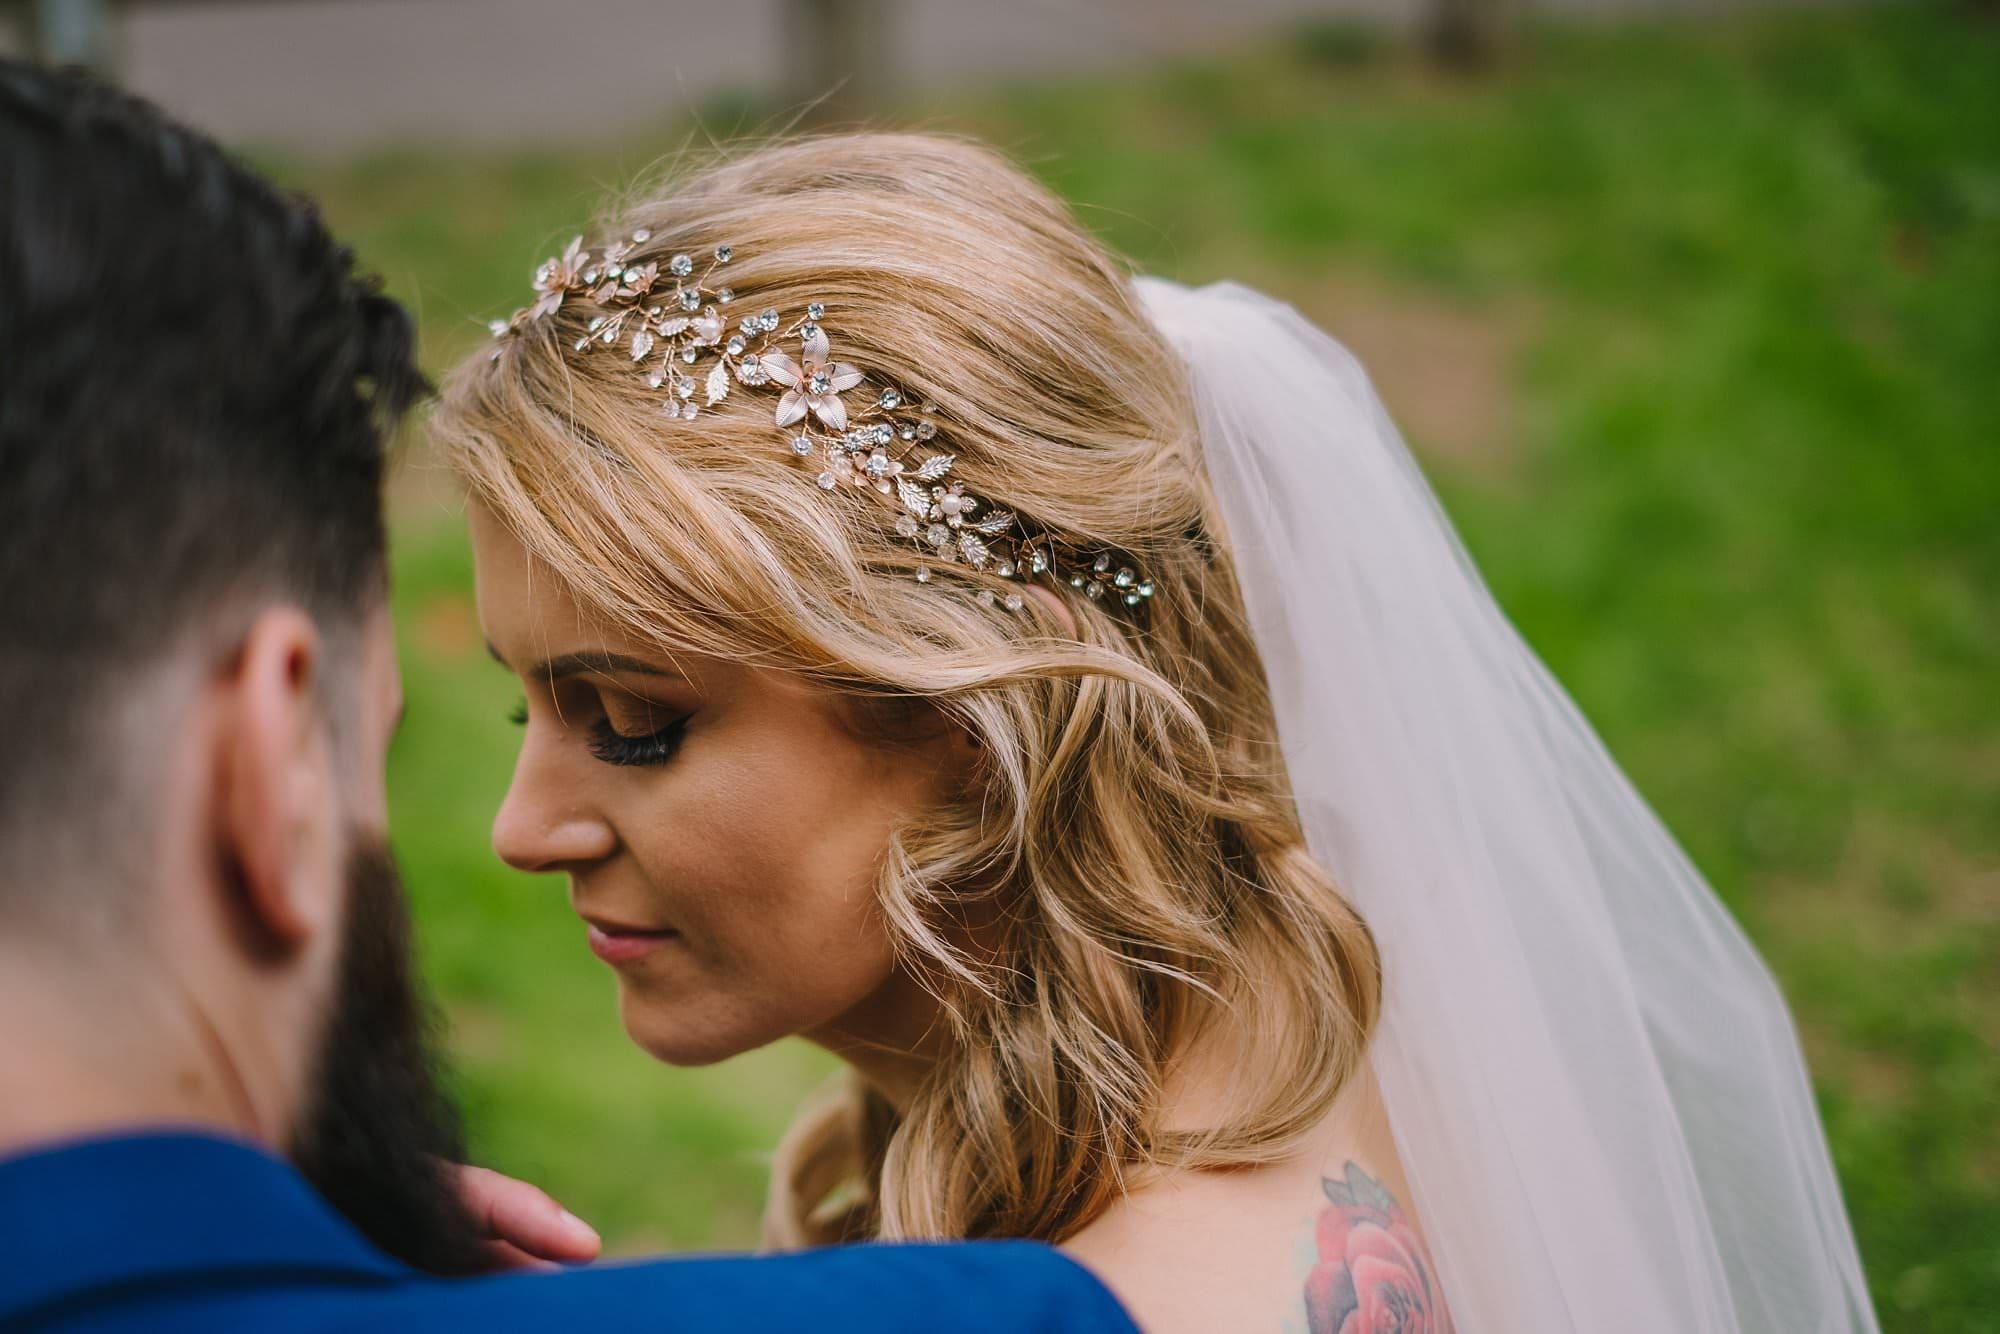 london pub wedding photographer jn 028 - The County Arms Wedding Photographer   Jen & Nick